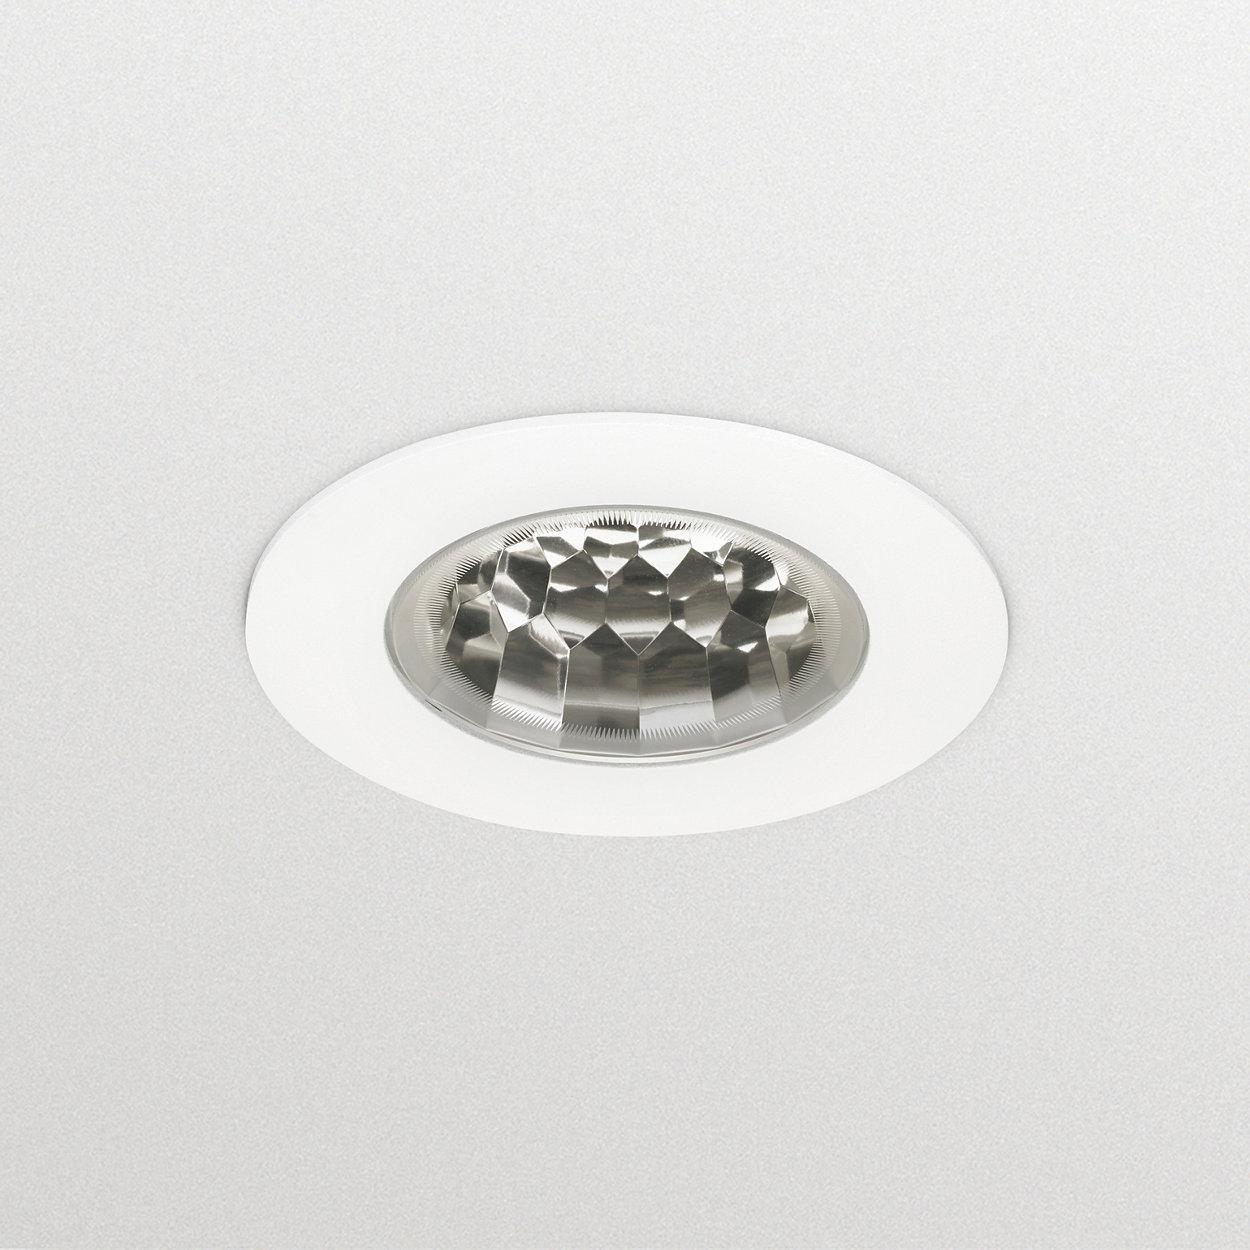 LuxSpace Accent - den mest energieffektiva serien för butiker